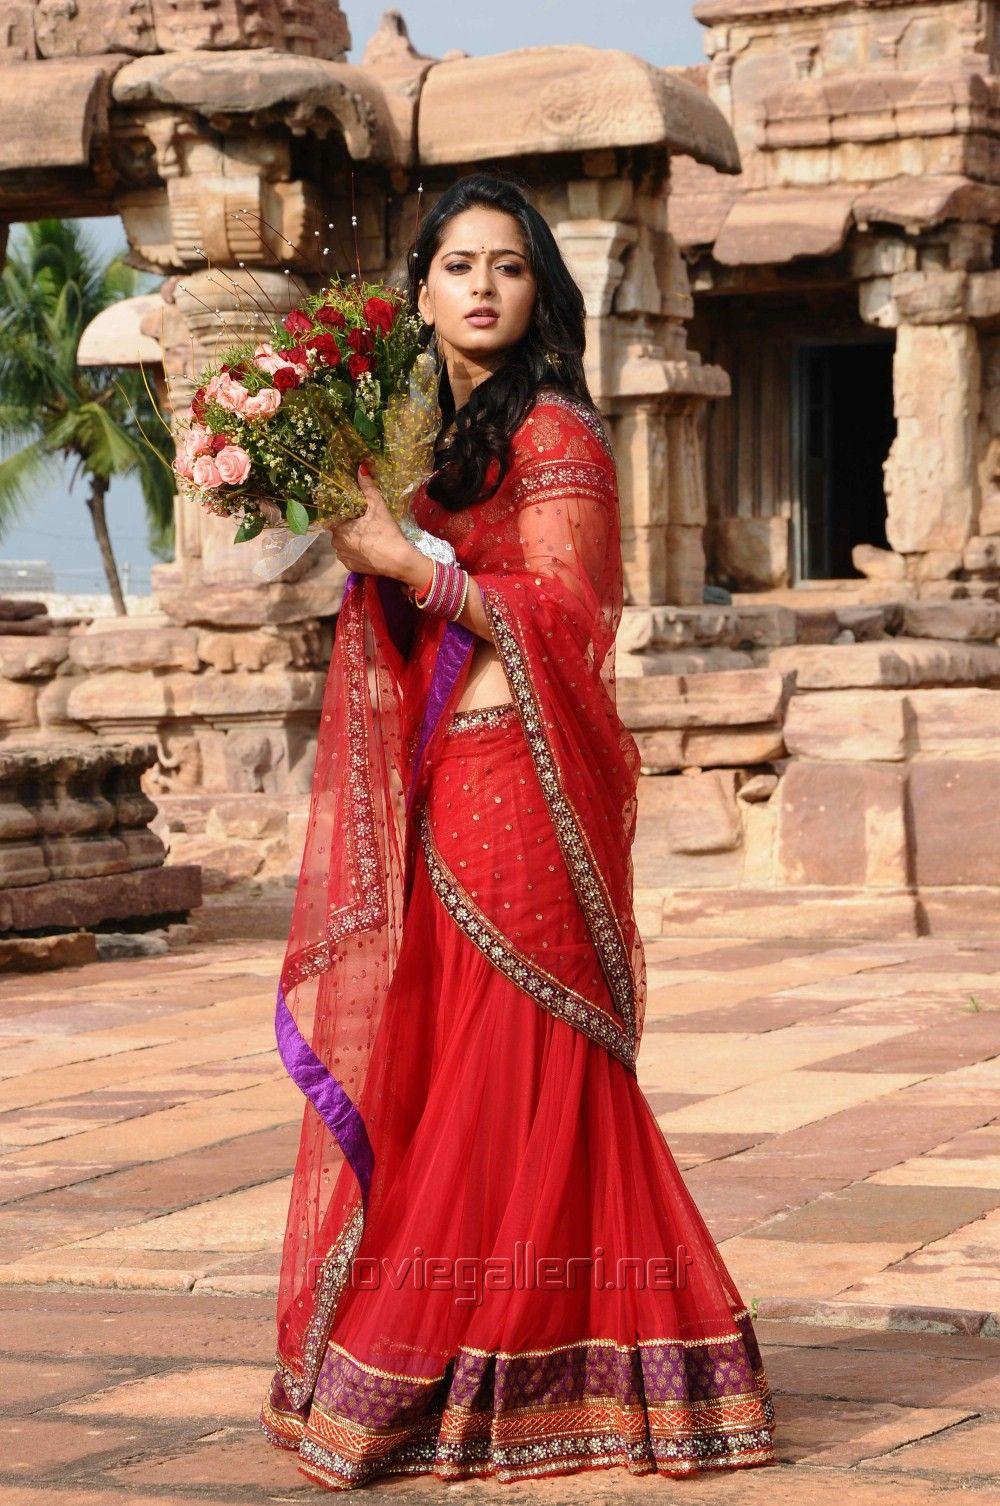 Anushka shetty anushka shetty hot stills pictures beautiful pictures -  Simplyfab Sweety Aka Anushka Shetty Anushkomania Pinterest Beautiful Actresses And Actresses